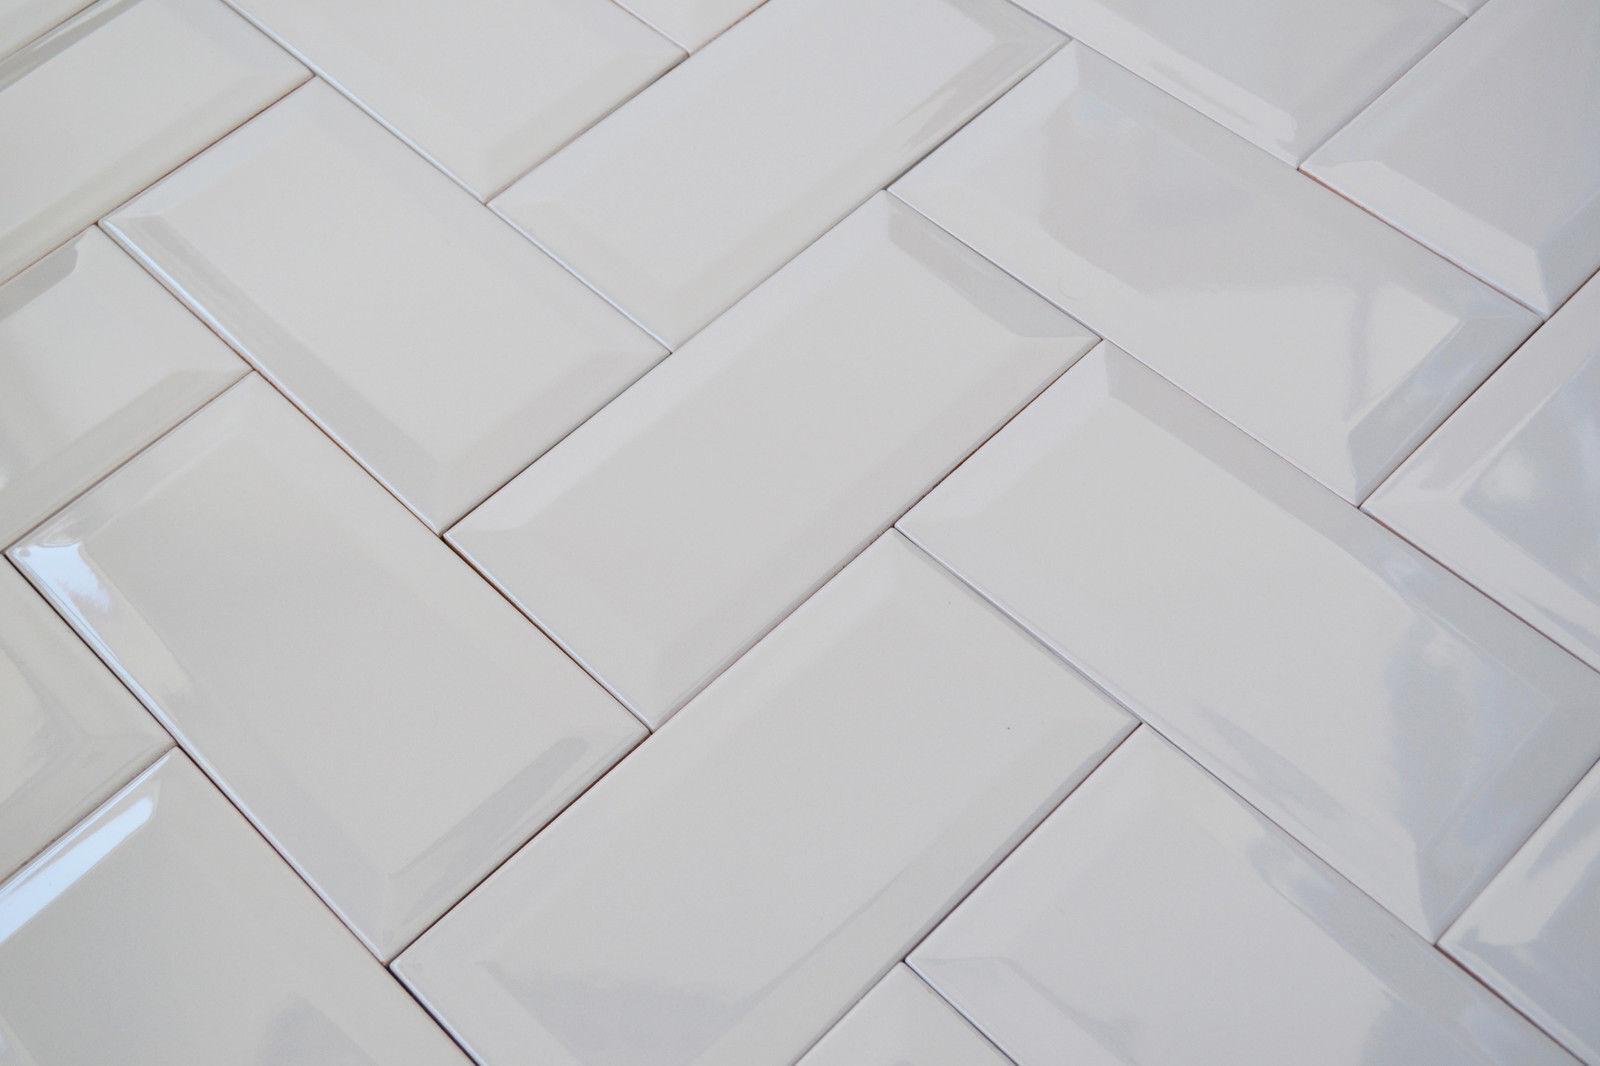 Ceramic tile edging ebay victorian metro brick bevel edged ceramic wall tiles pastel grey 10x10 sample dailygadgetfo Gallery